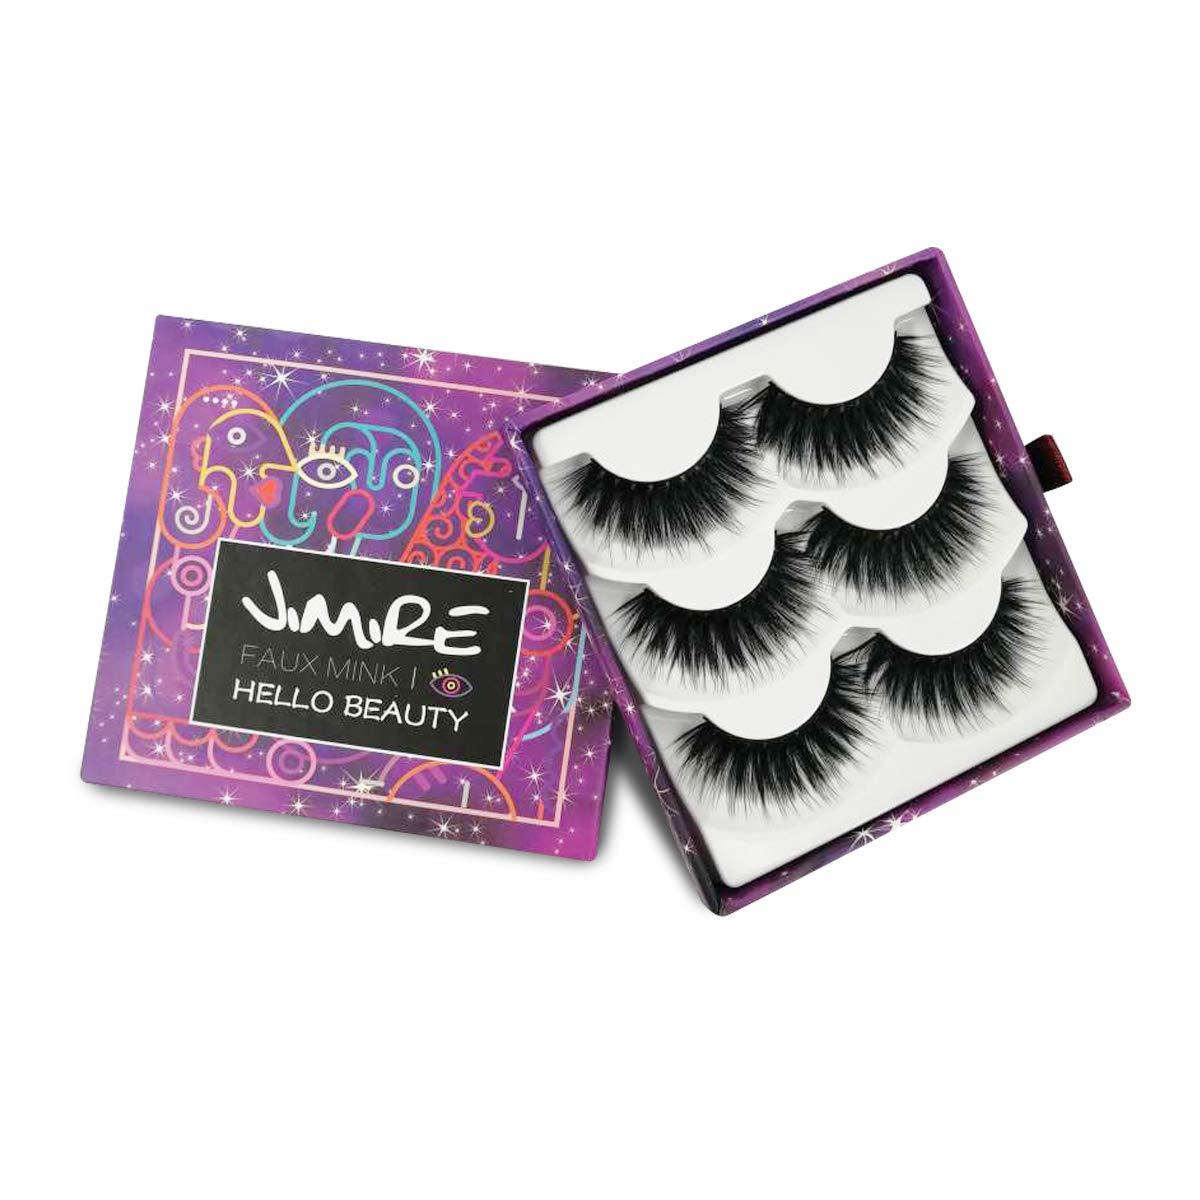 cc50a8115eb Amazon.com : JIMIRE Fake Eyelashes 3D Natural Lashes Pack Reusable False Eyelashes  3 Pairs : Beauty